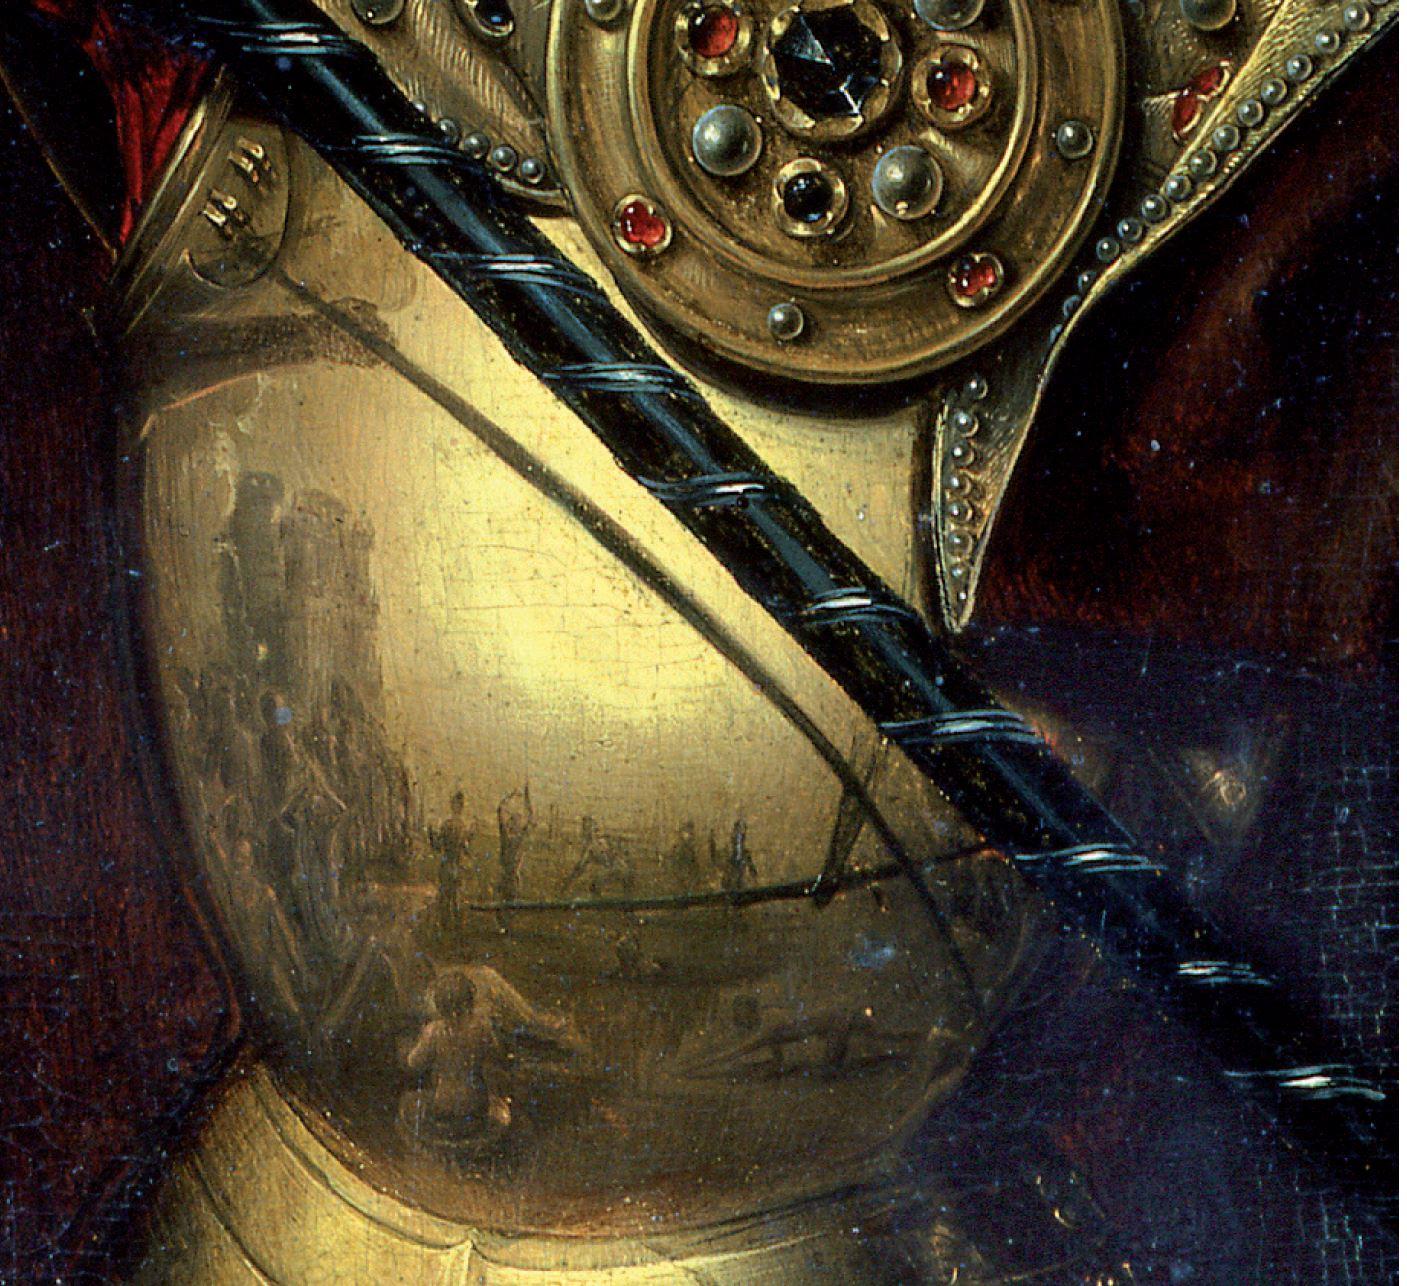 Memling 1467-1471 Jugement dernier Gdansk armure